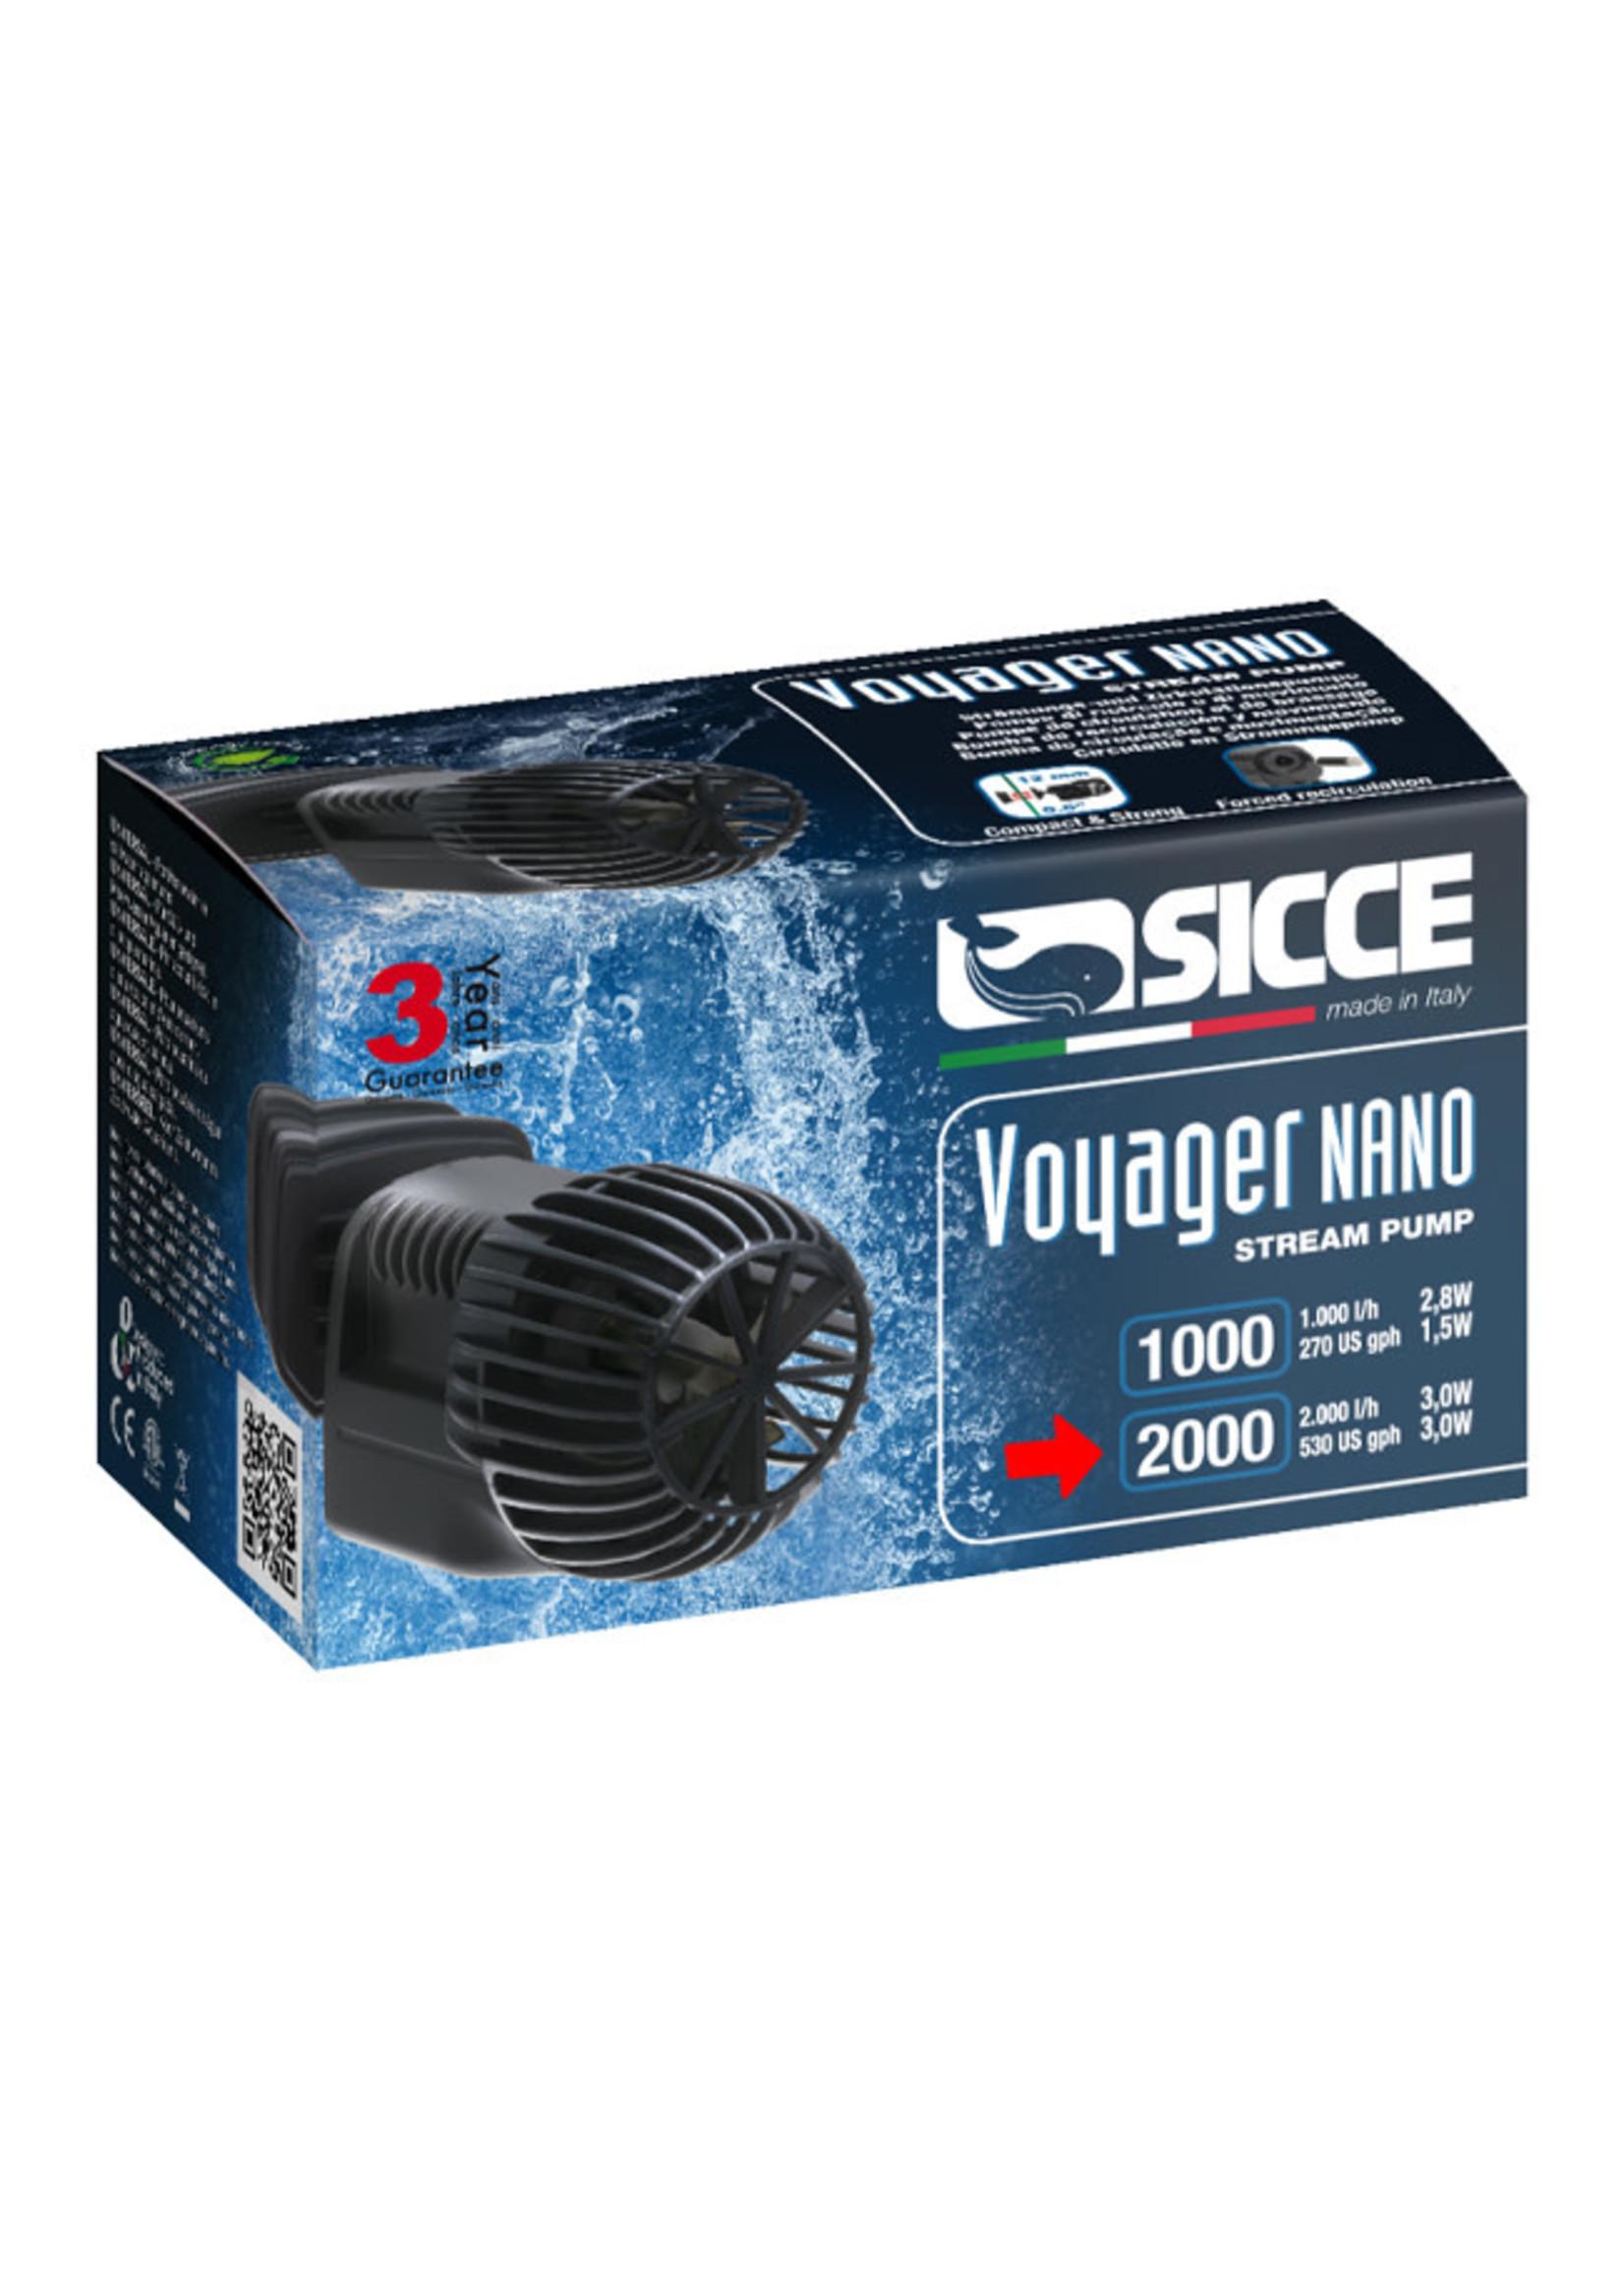 SICCE US, Inc. Sicce Voyager Nano Stream Pump 2000, 530gph